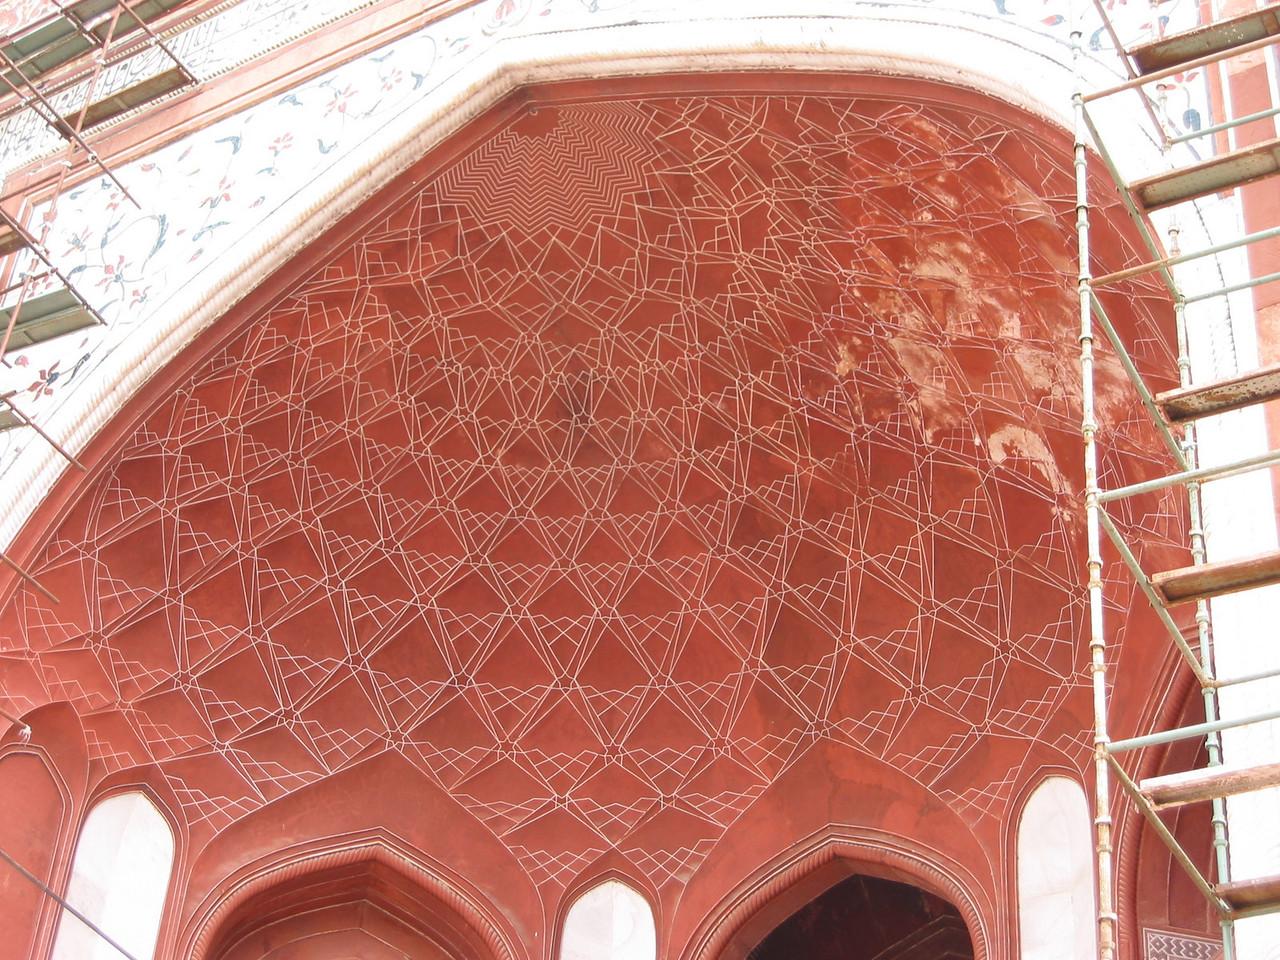 Taj Mahal (detail on gate)